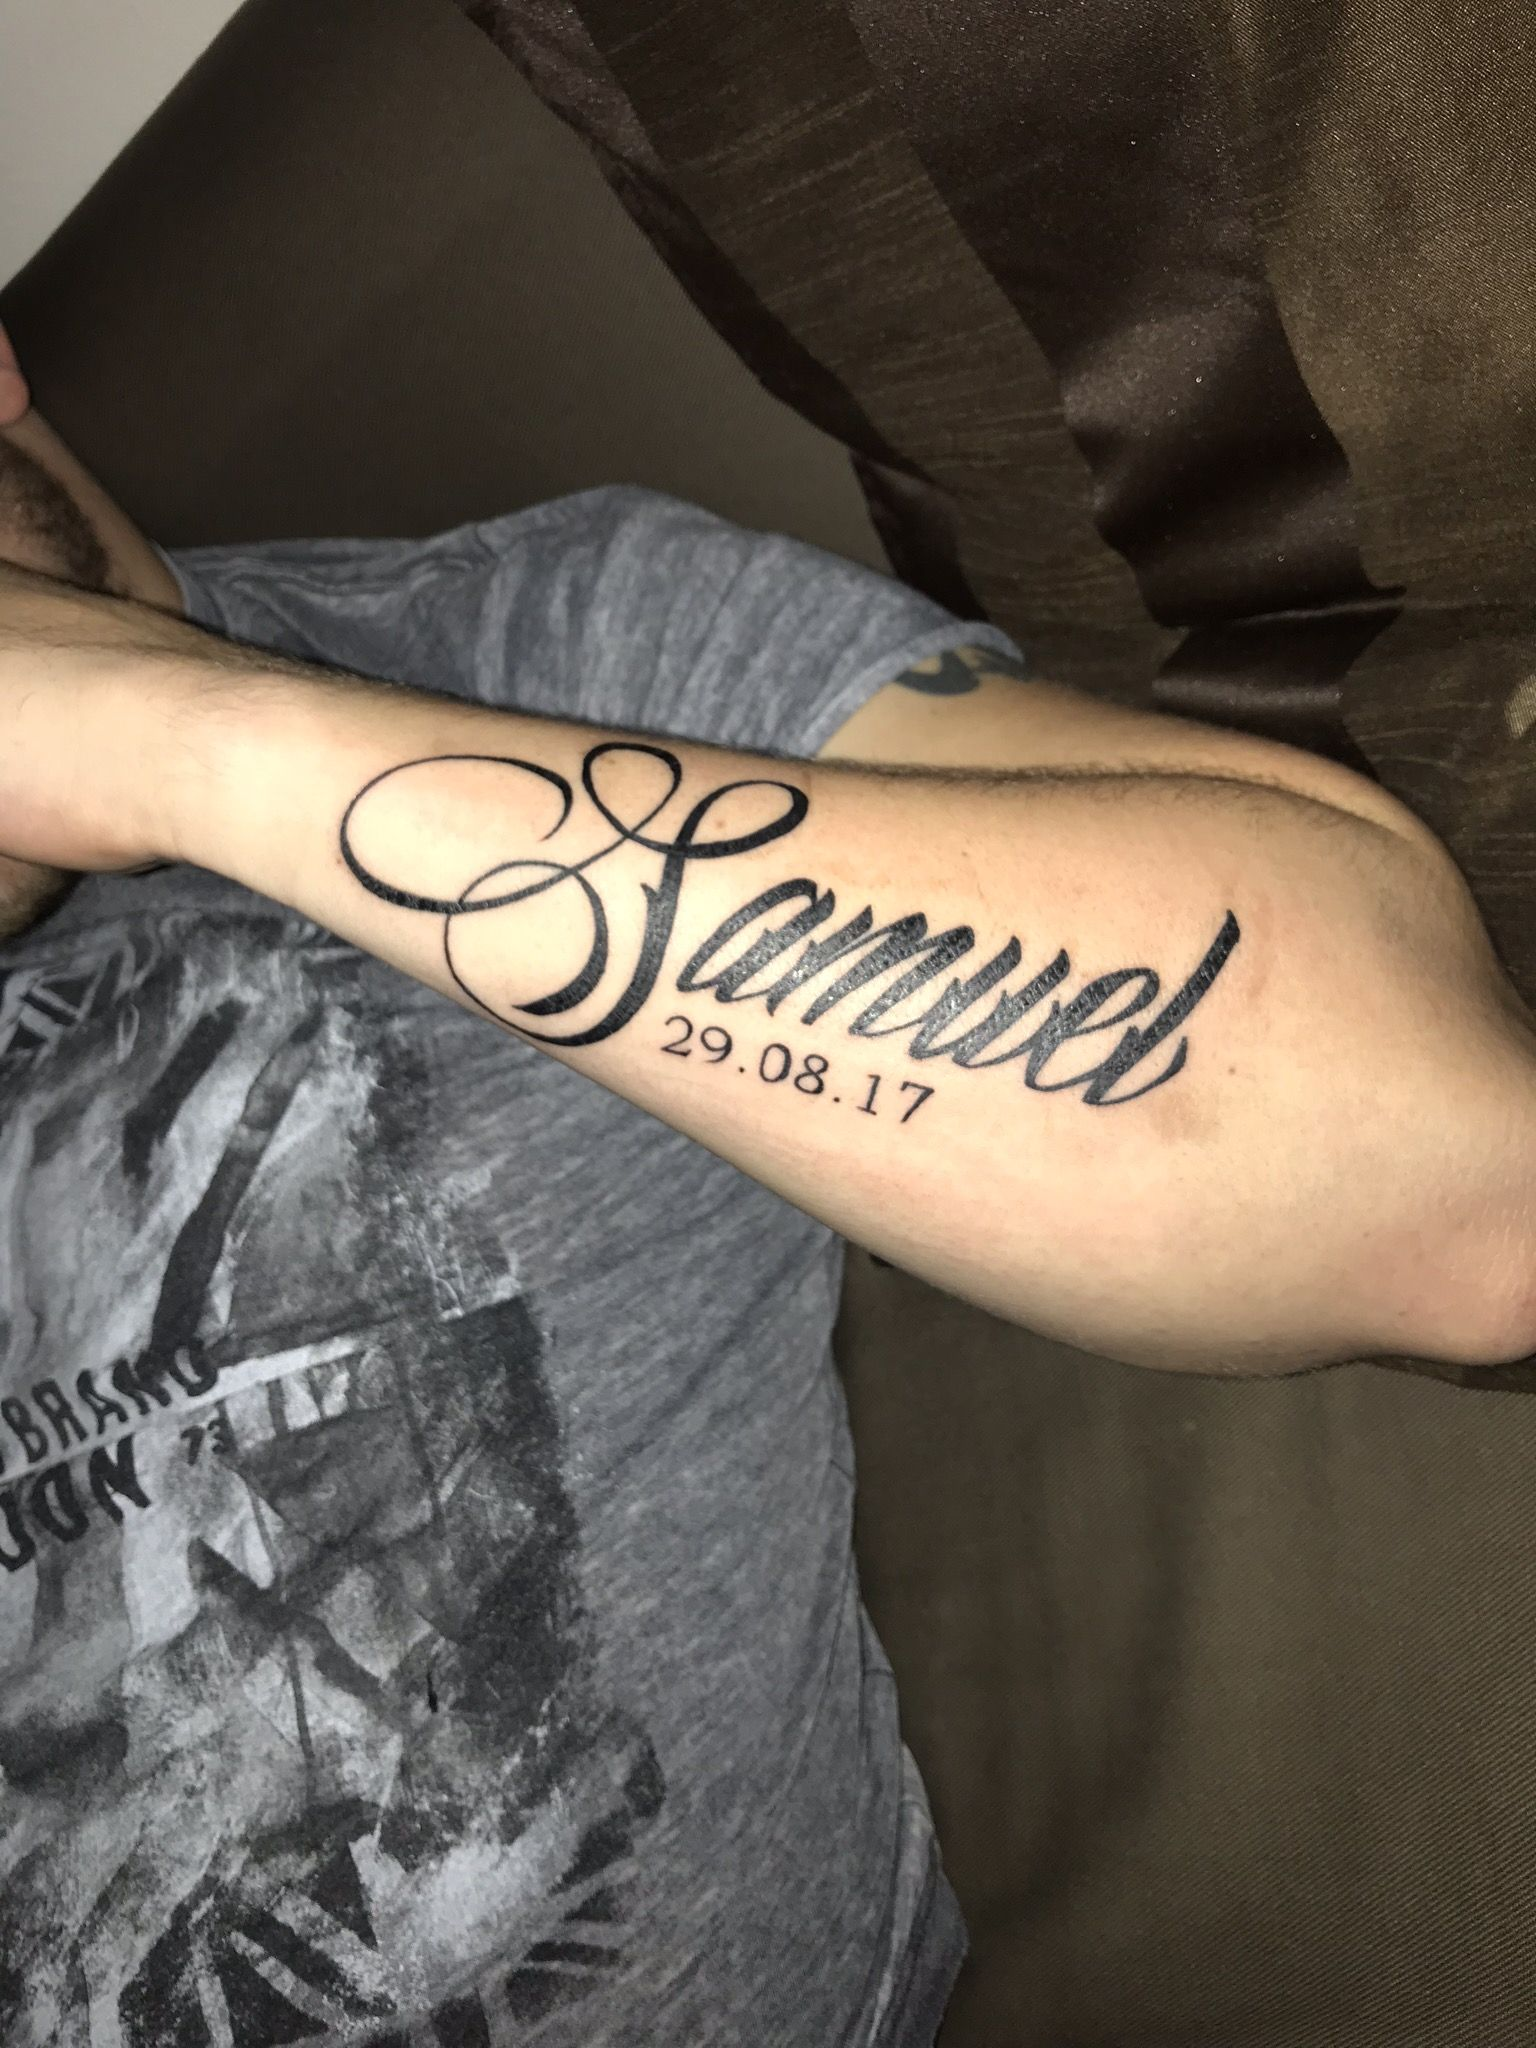 Tattoo Samuel Tatuajes De Nombres Tatuaje De Nombre De Hijo Tatuaje Nombre Hijos